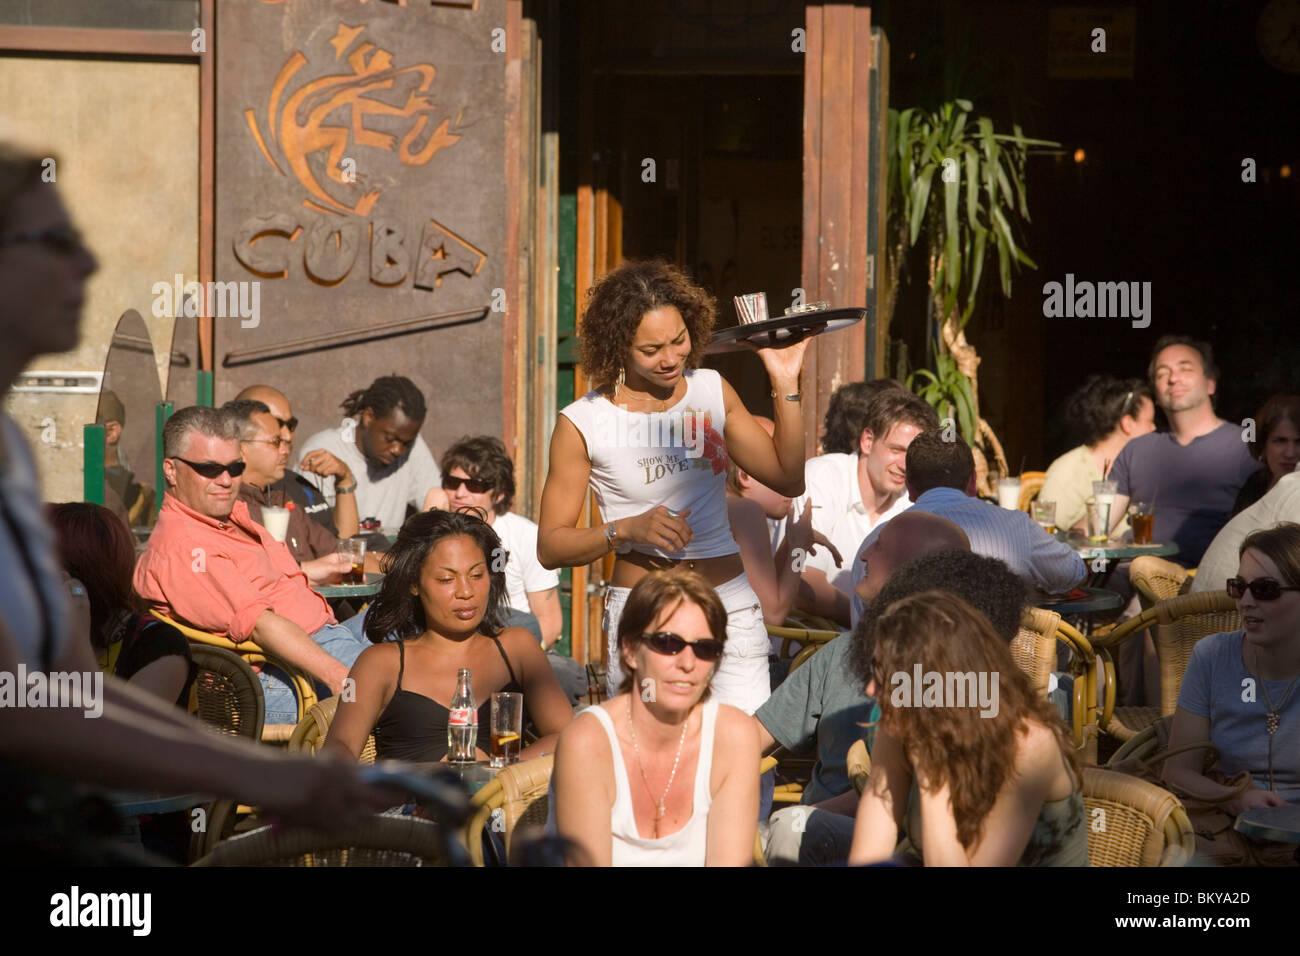 Gäste, Cafe Cuba, Nieuwmarkt, Kellnerin, Kellnerin, Getränke im Café ...